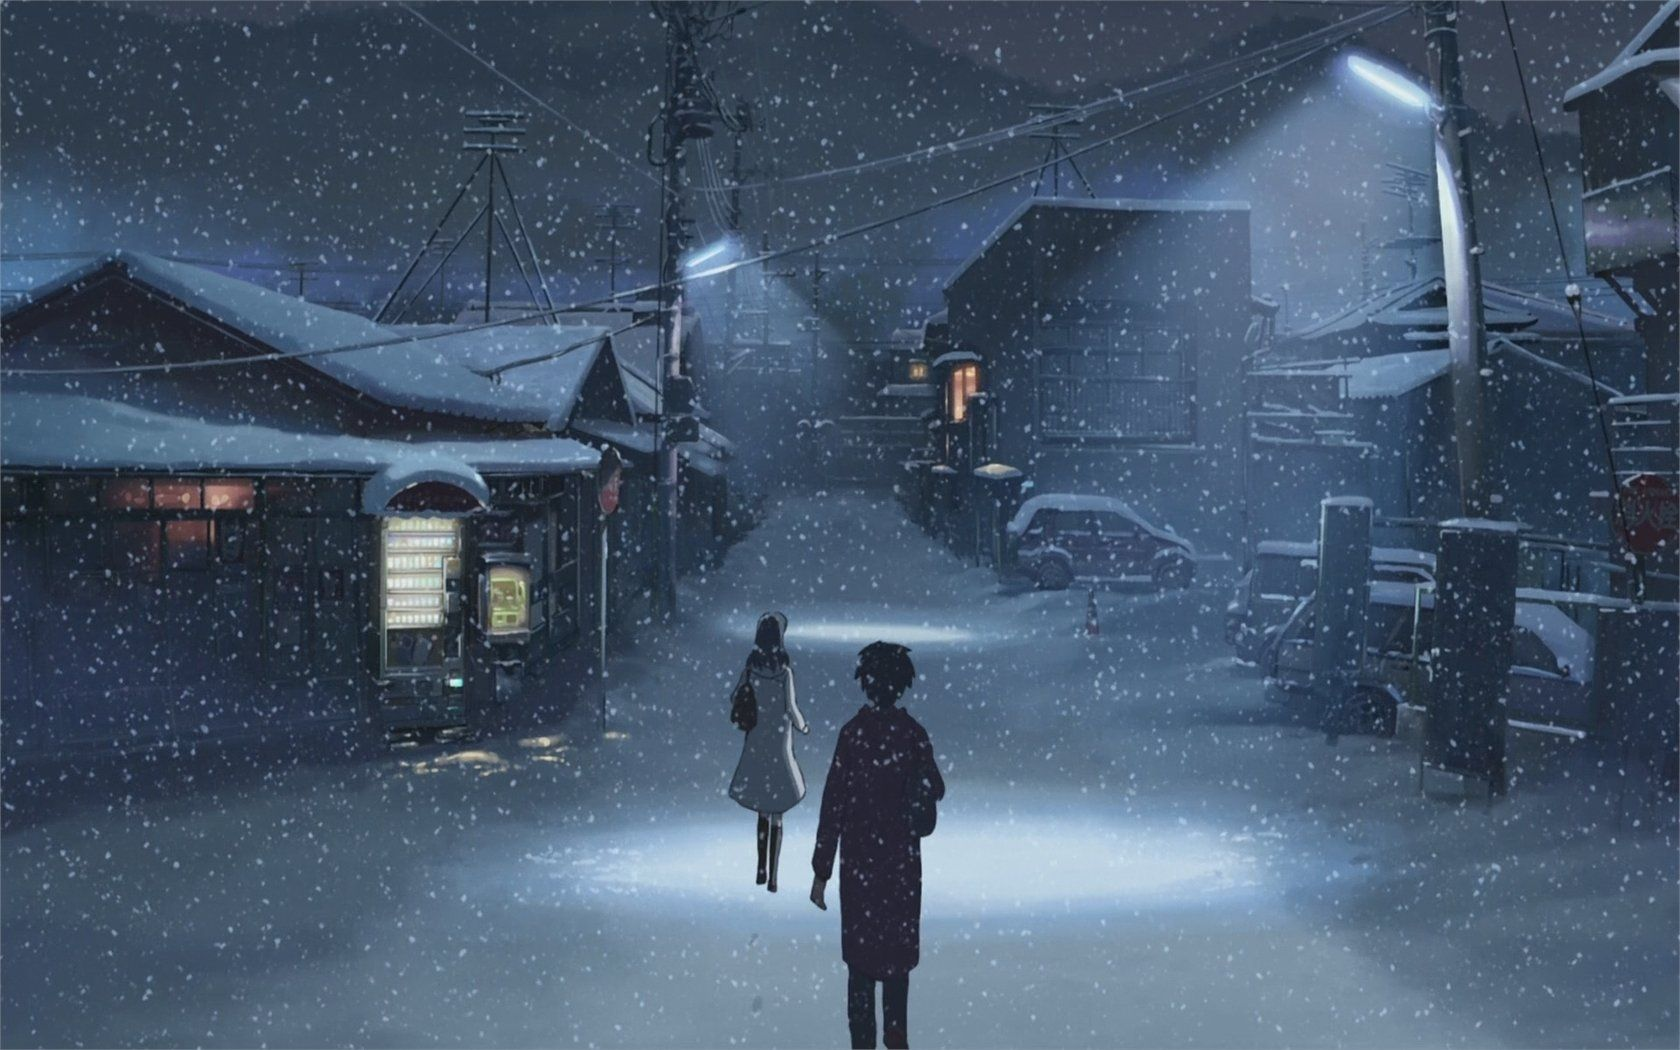 Anime 5 Centimeters Per Second Takaki Touno Akari Shinohara